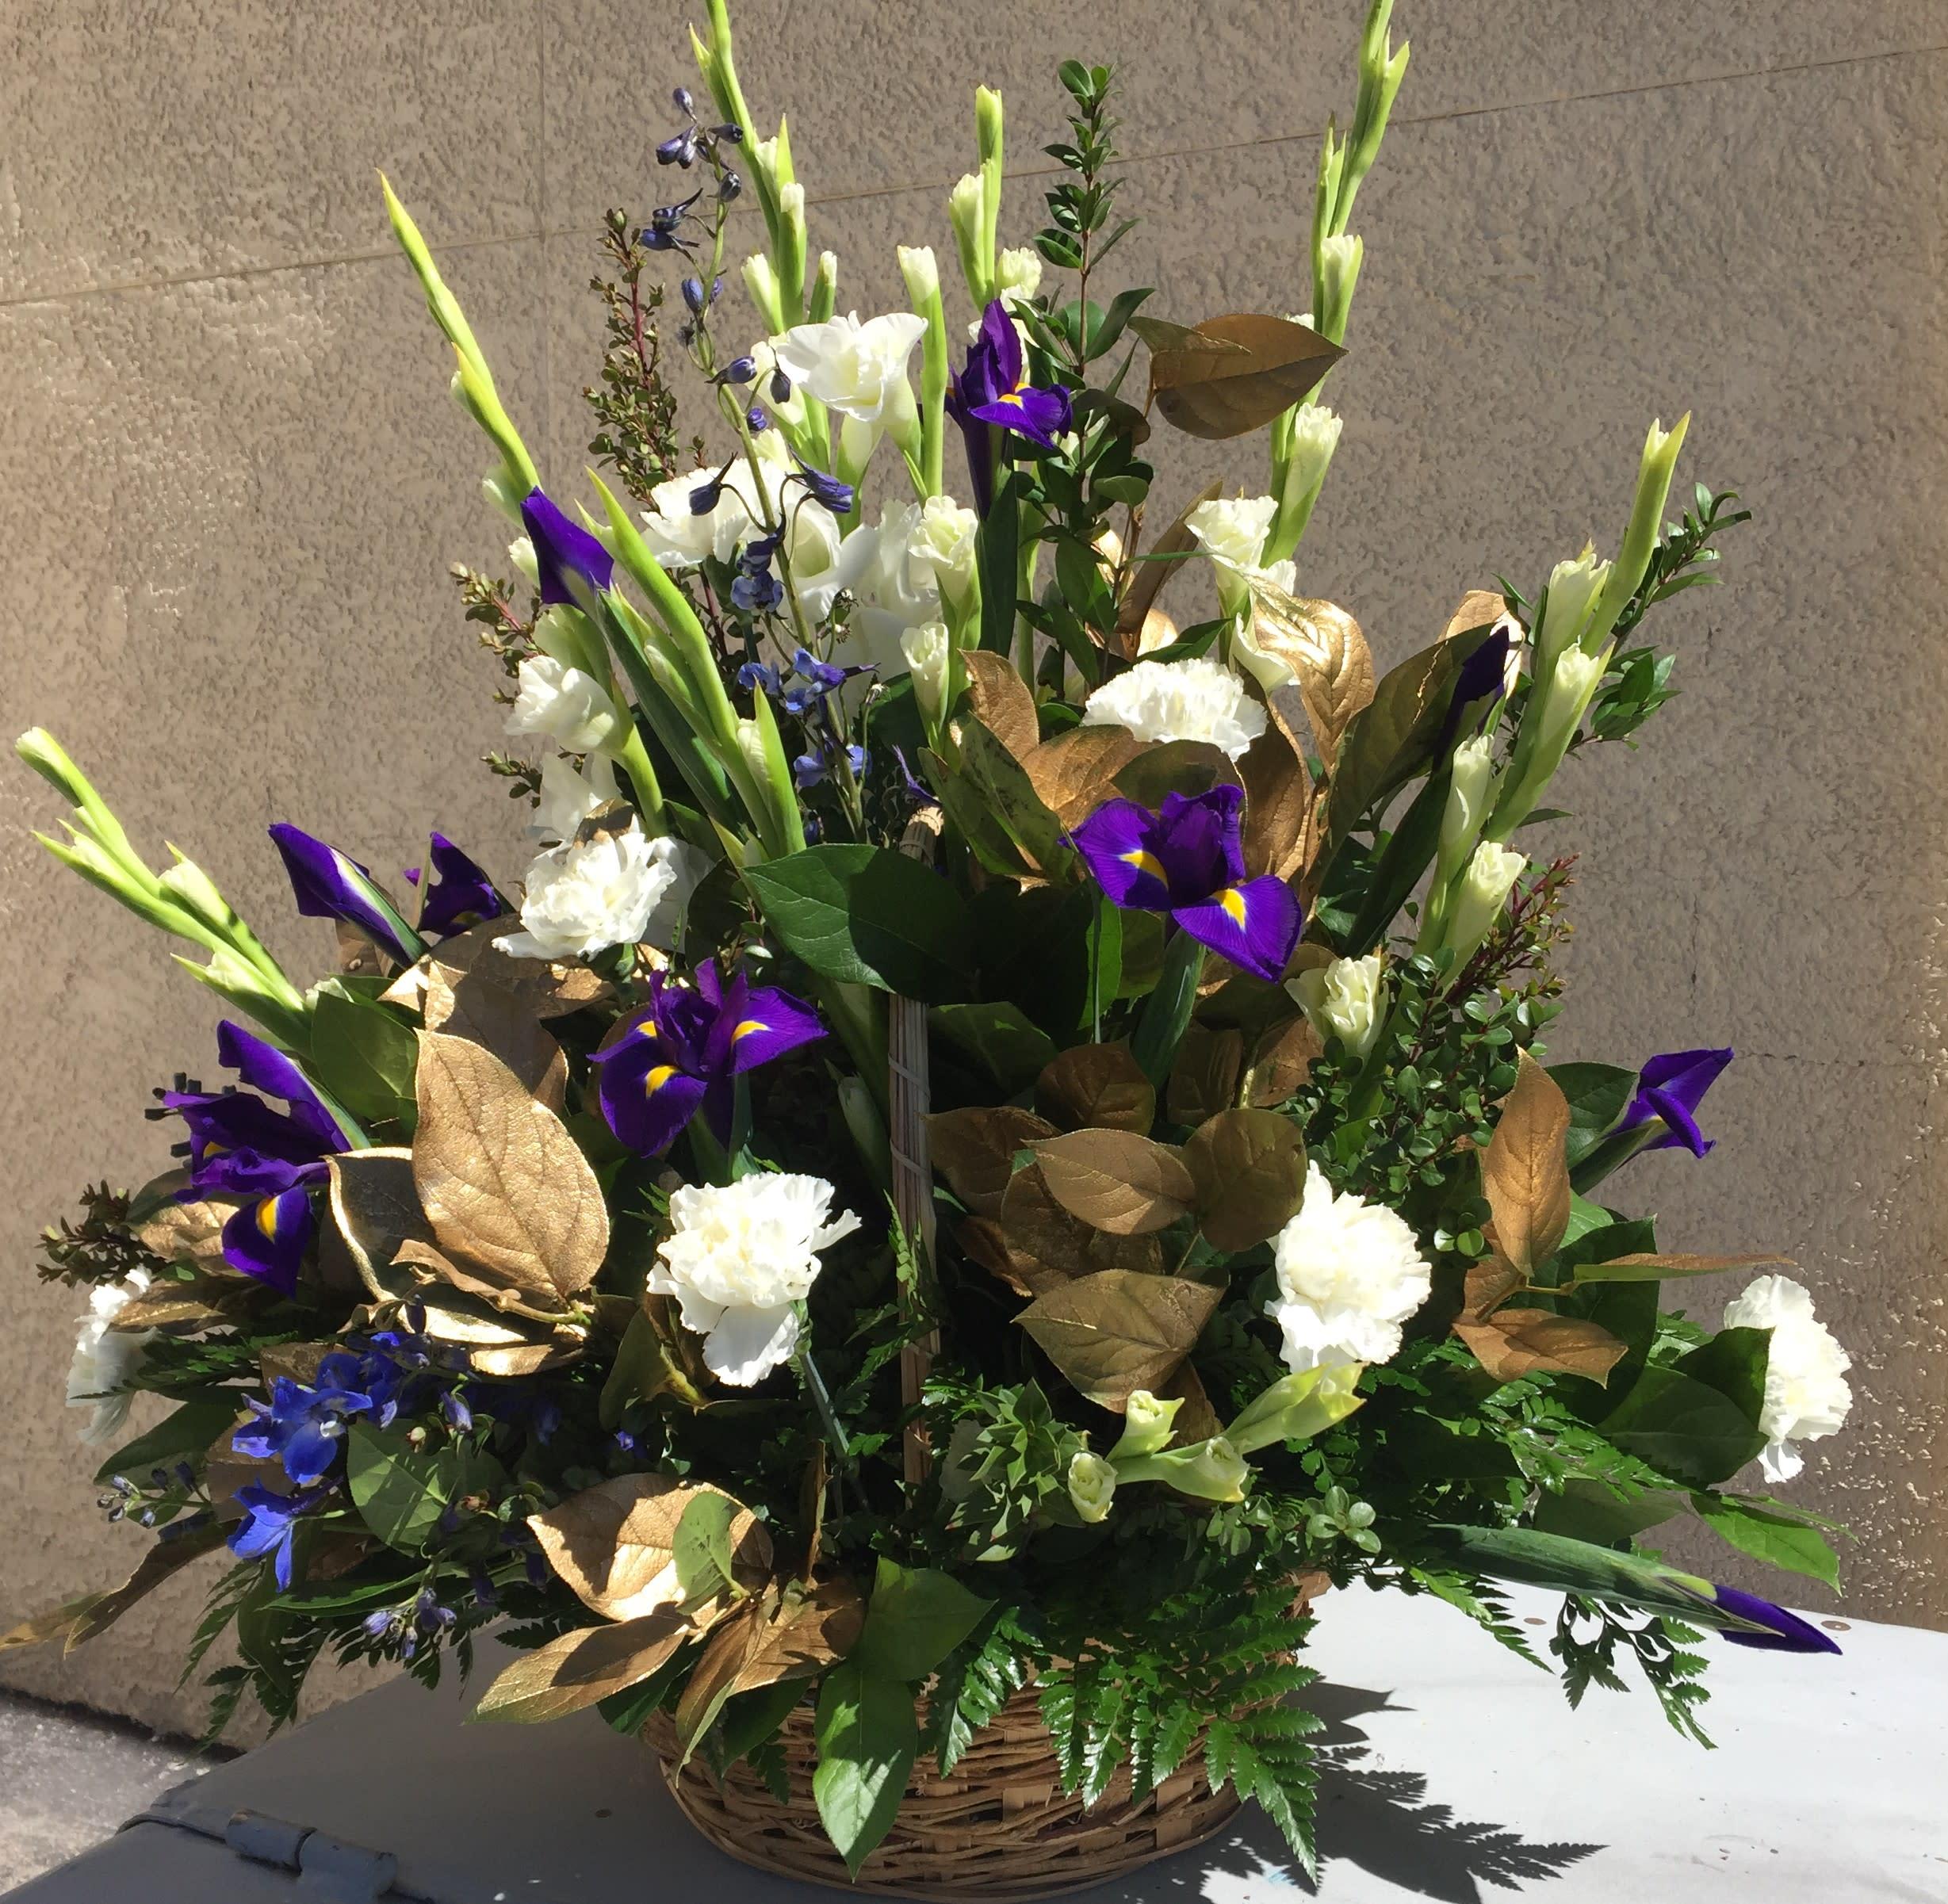 Spring Flowers Basket In Las Vegas Nv Sun City Summerlin Florist